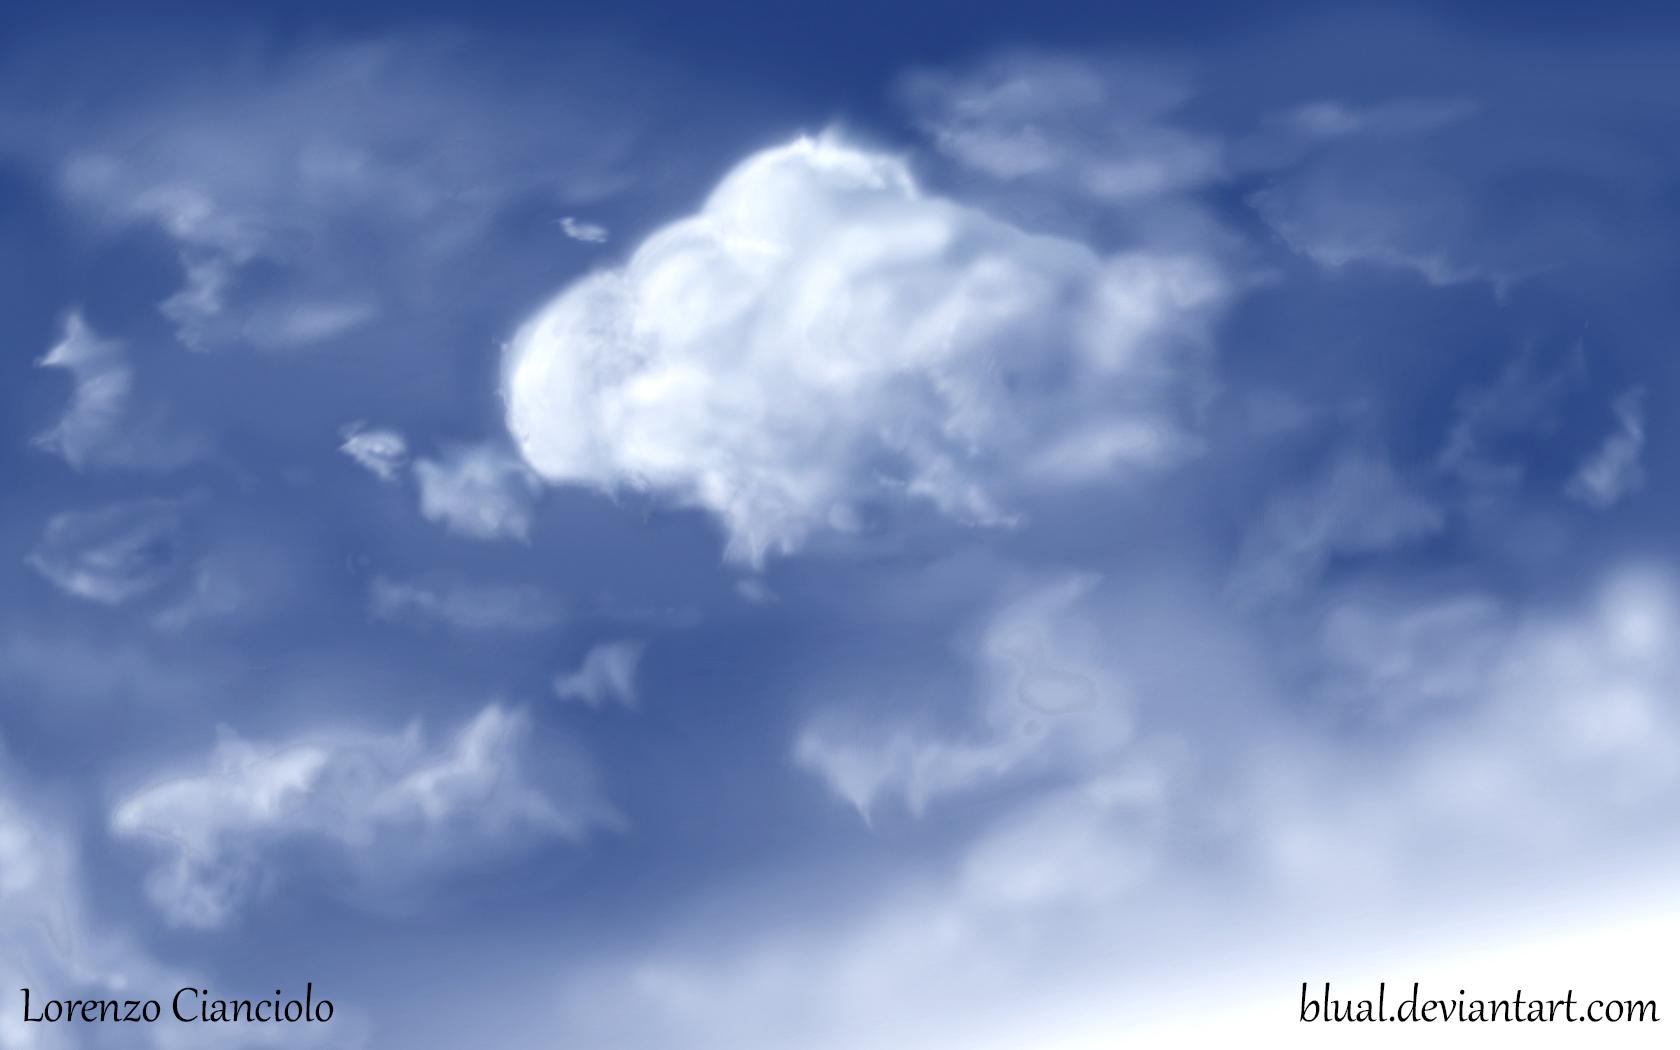 Drawn sky Drawn Hand 02 sky on